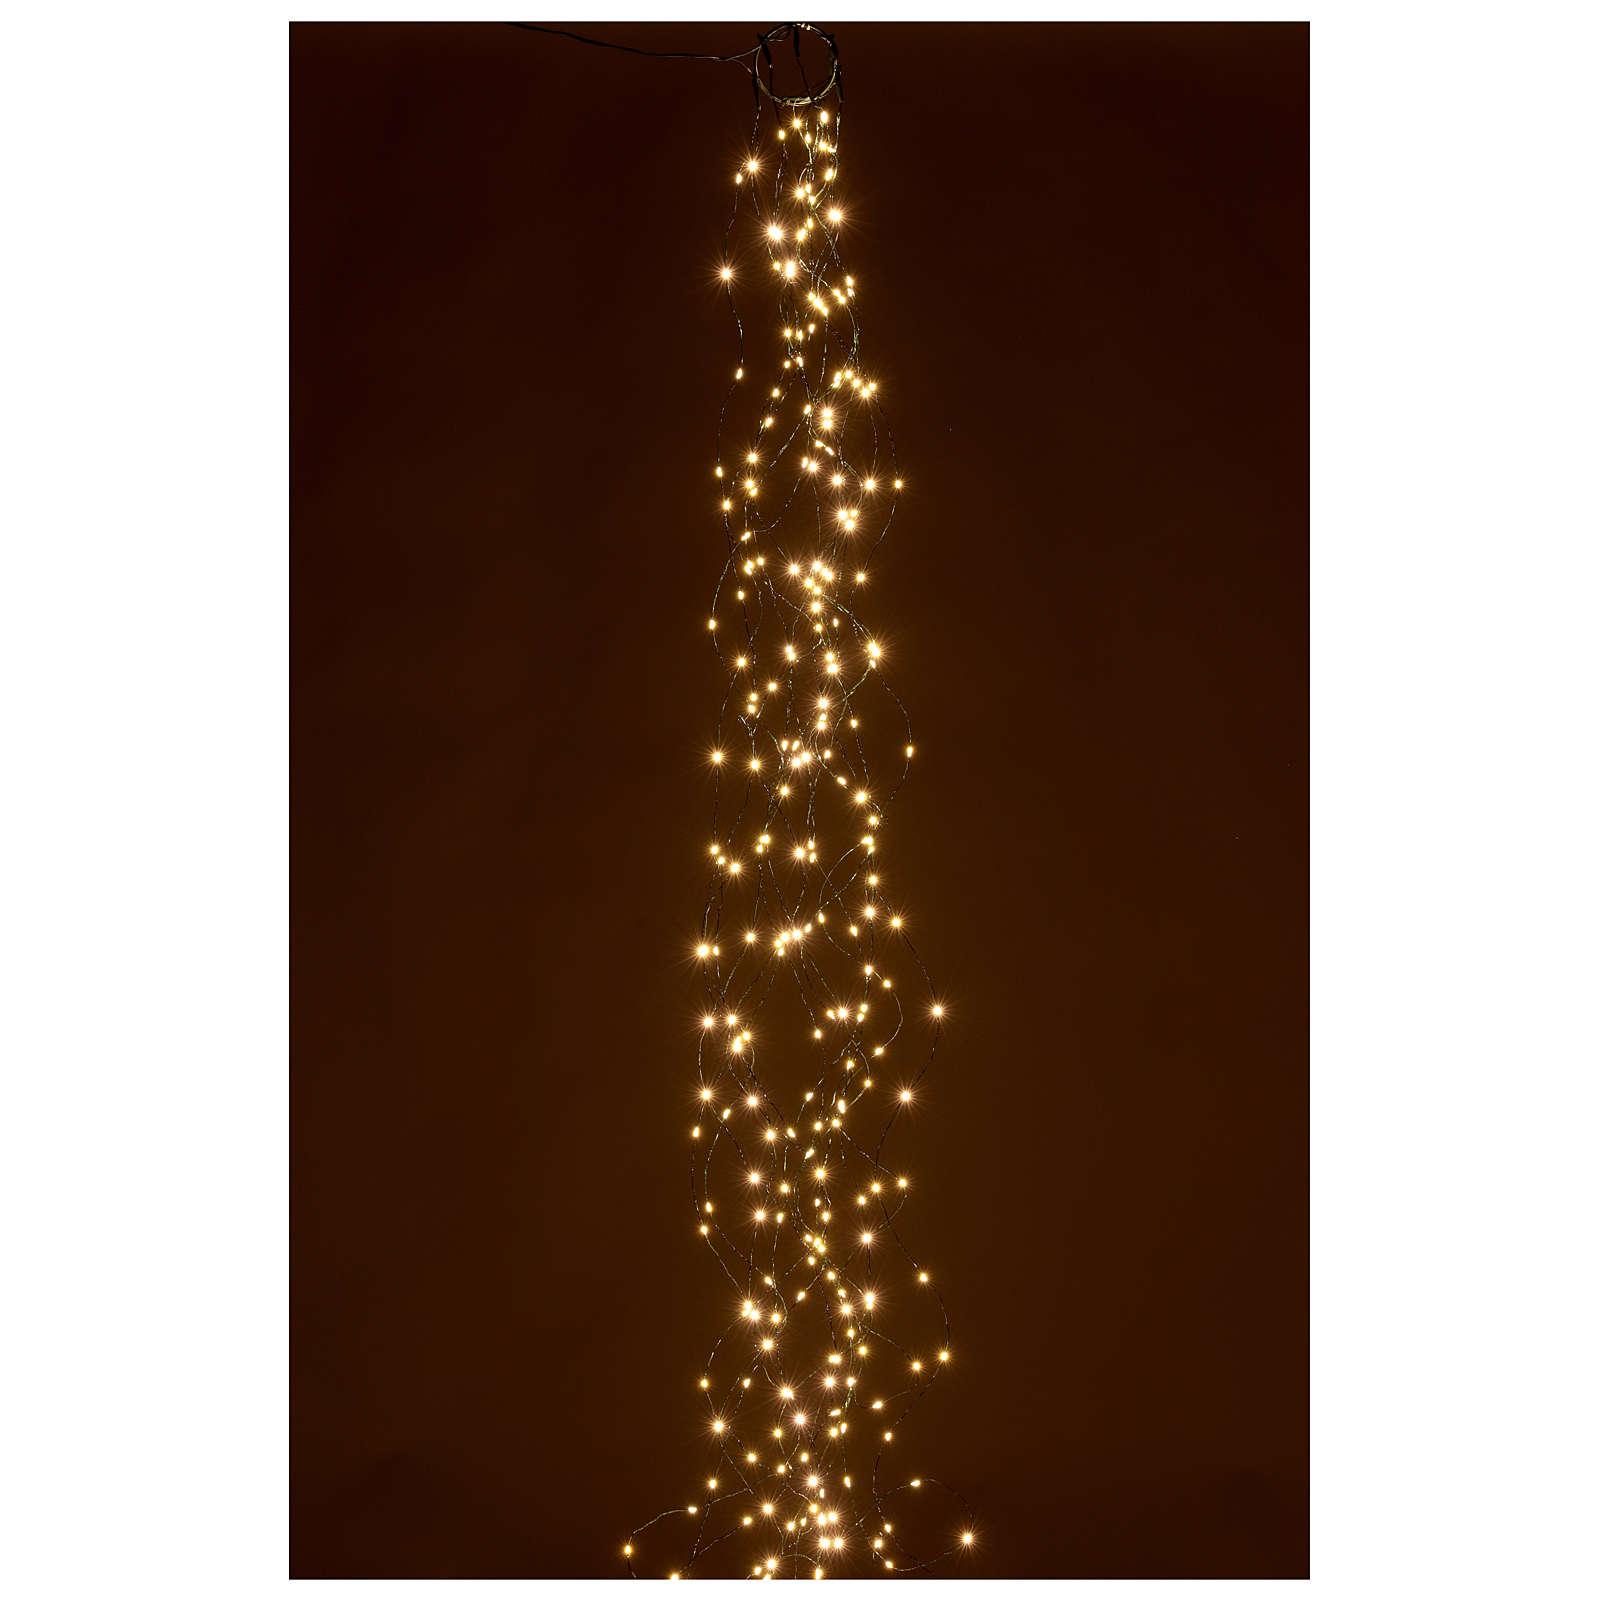 Luci natalizie tenda 294 nanoled luce bianco caldo 220V 3